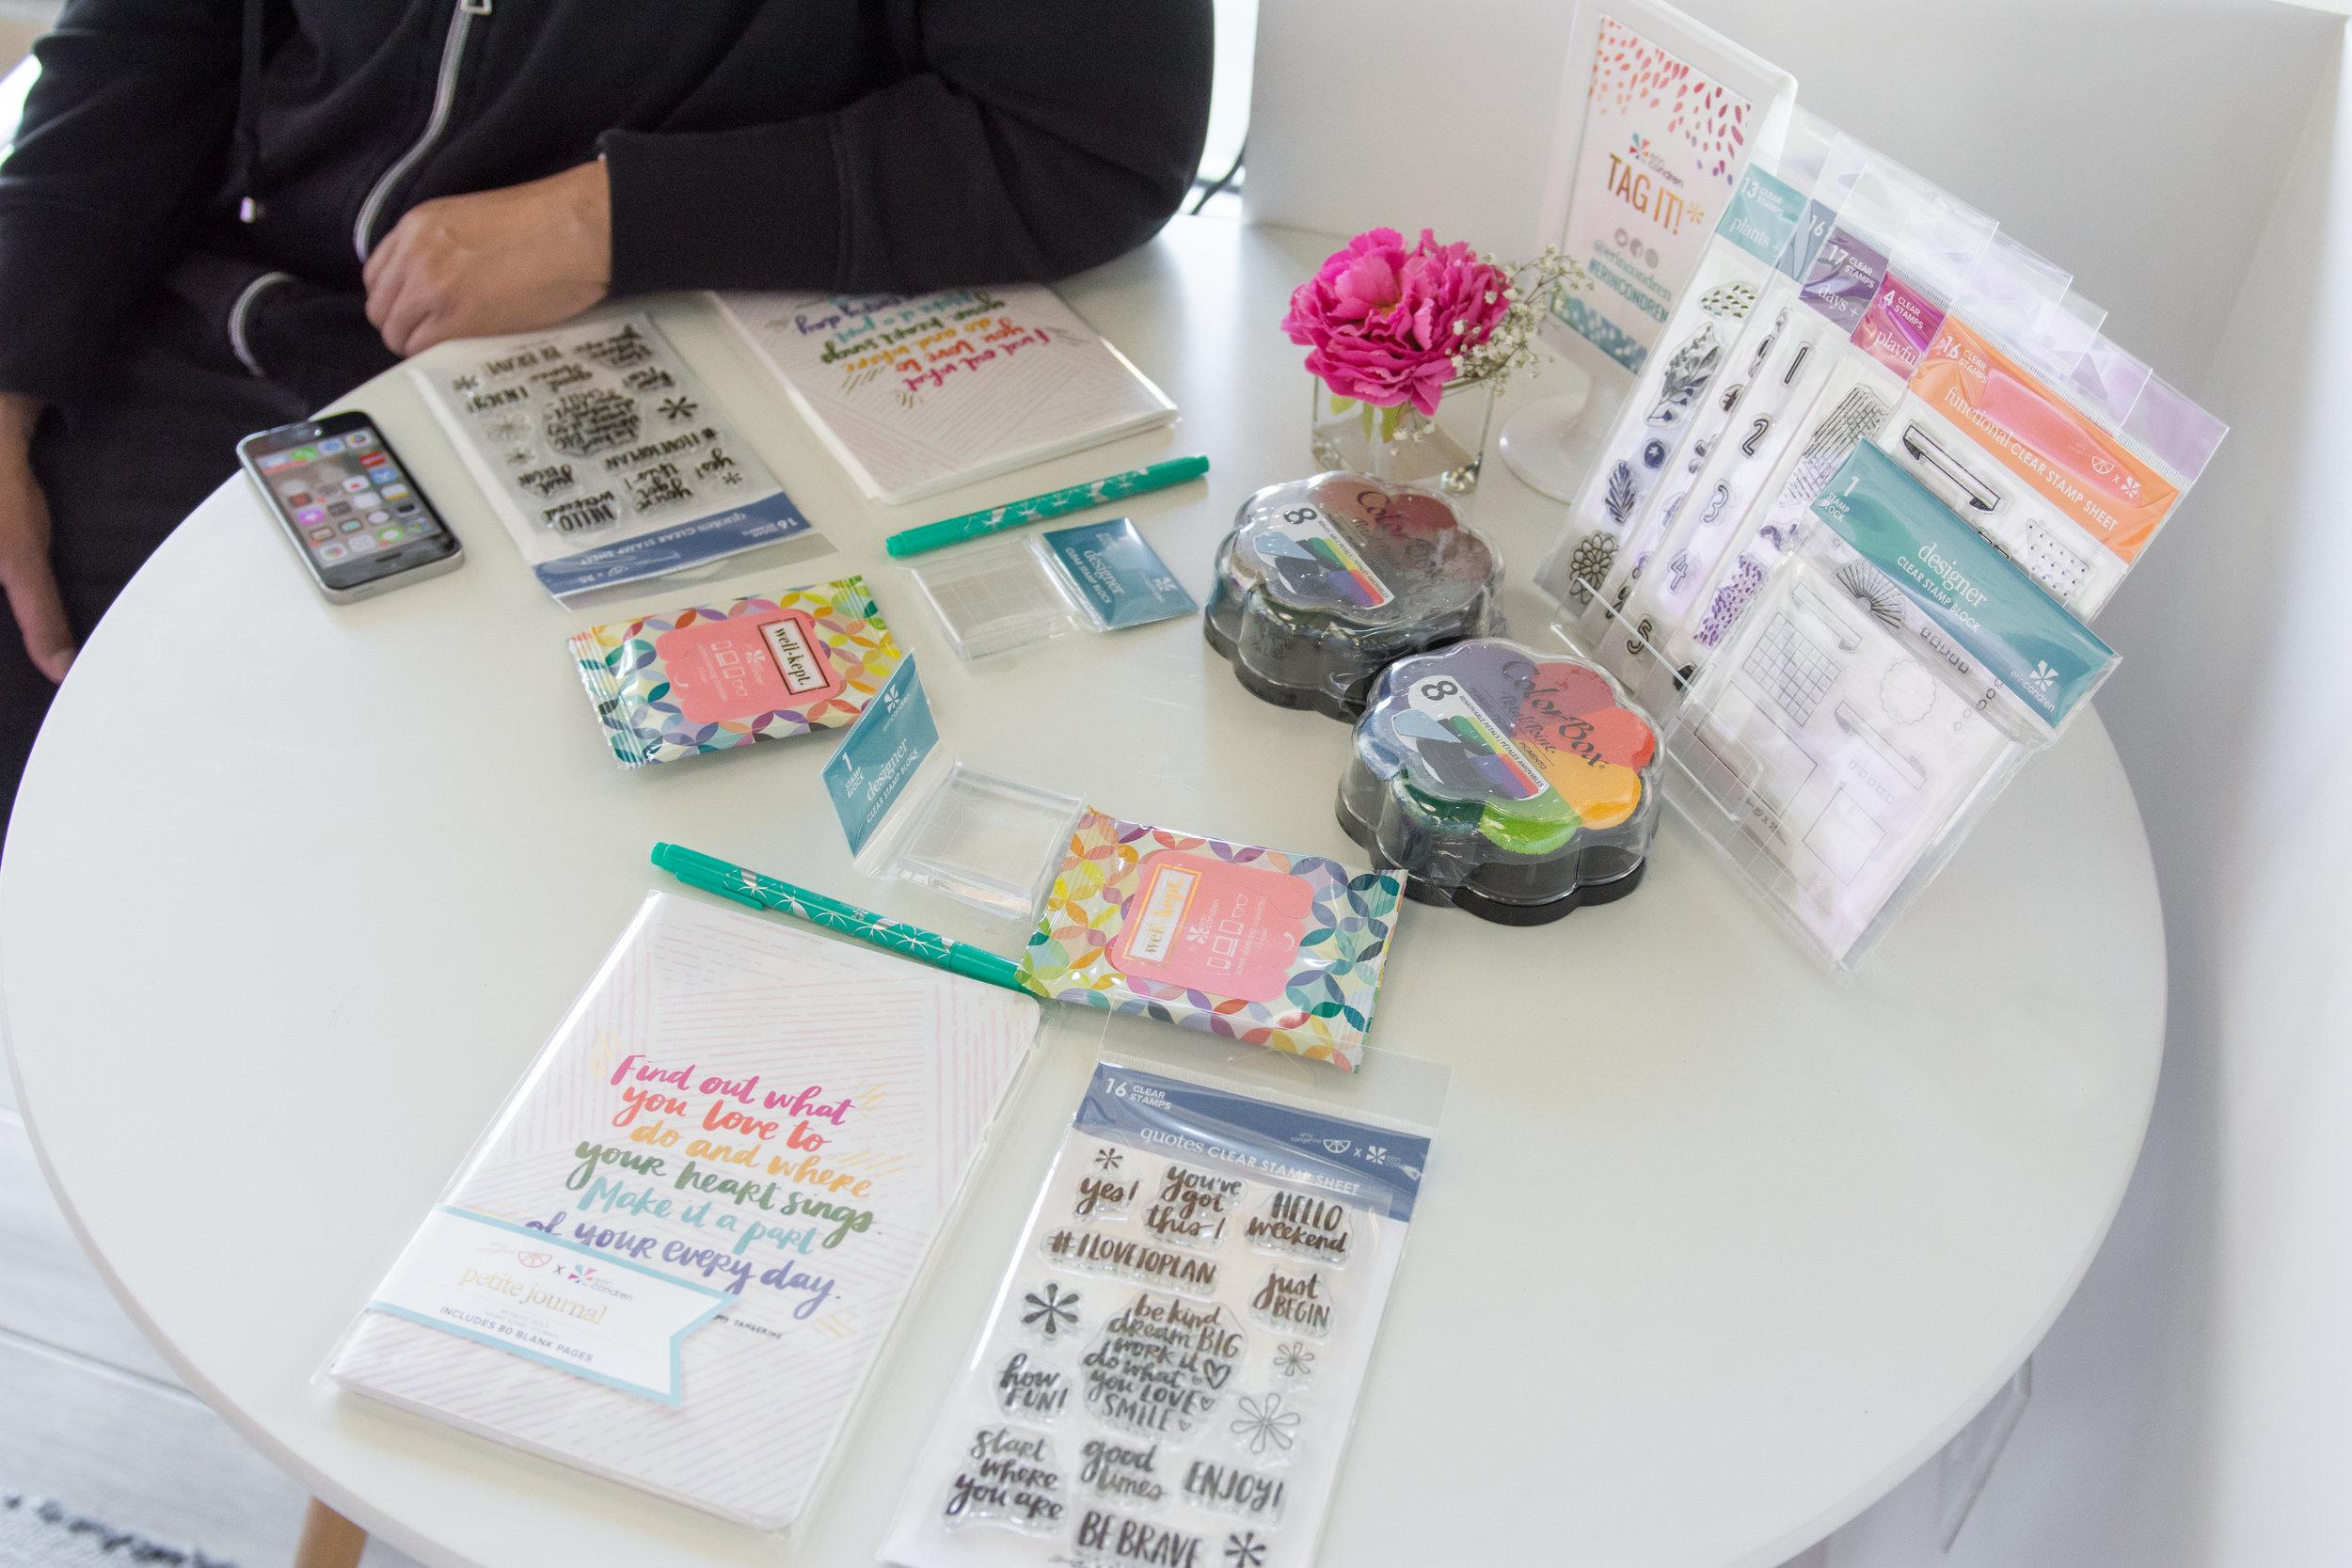 Highlights from the Erin Condren Workshop